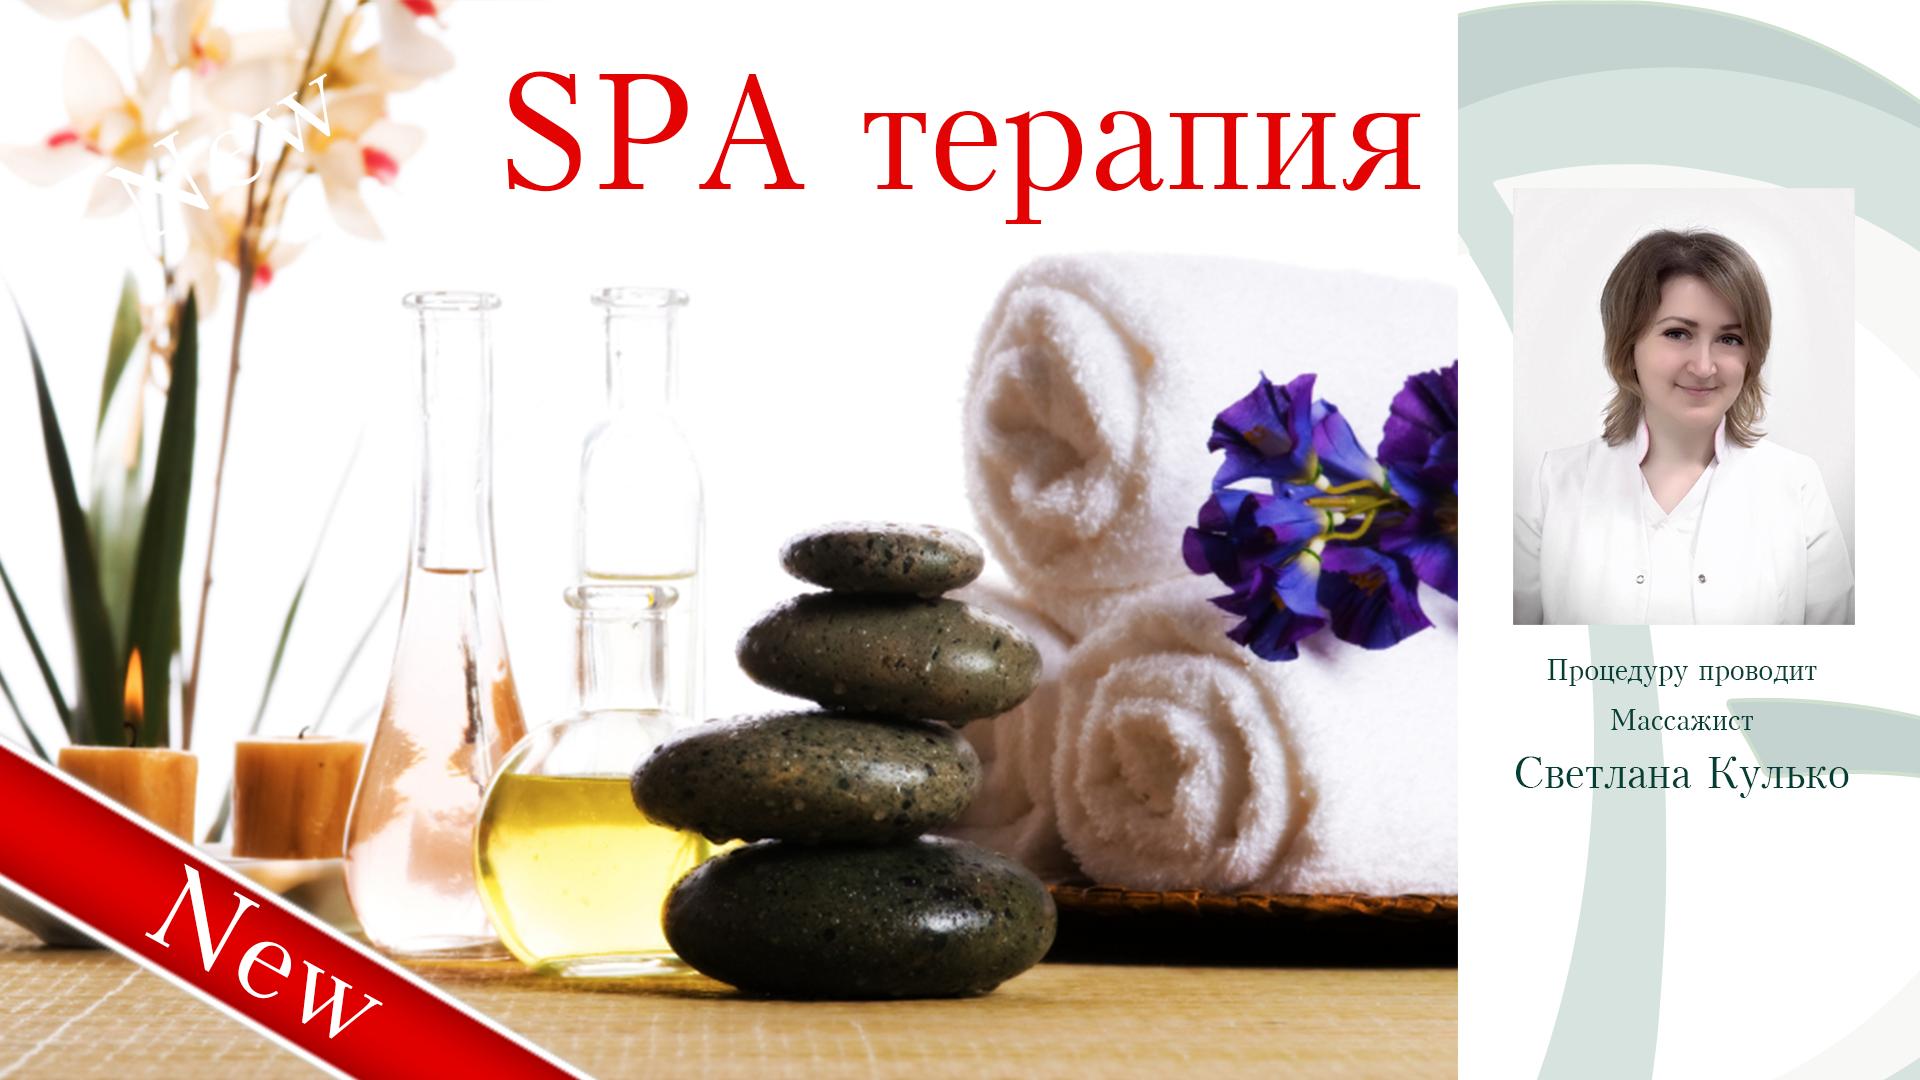 SPA терапия, Москва, цены